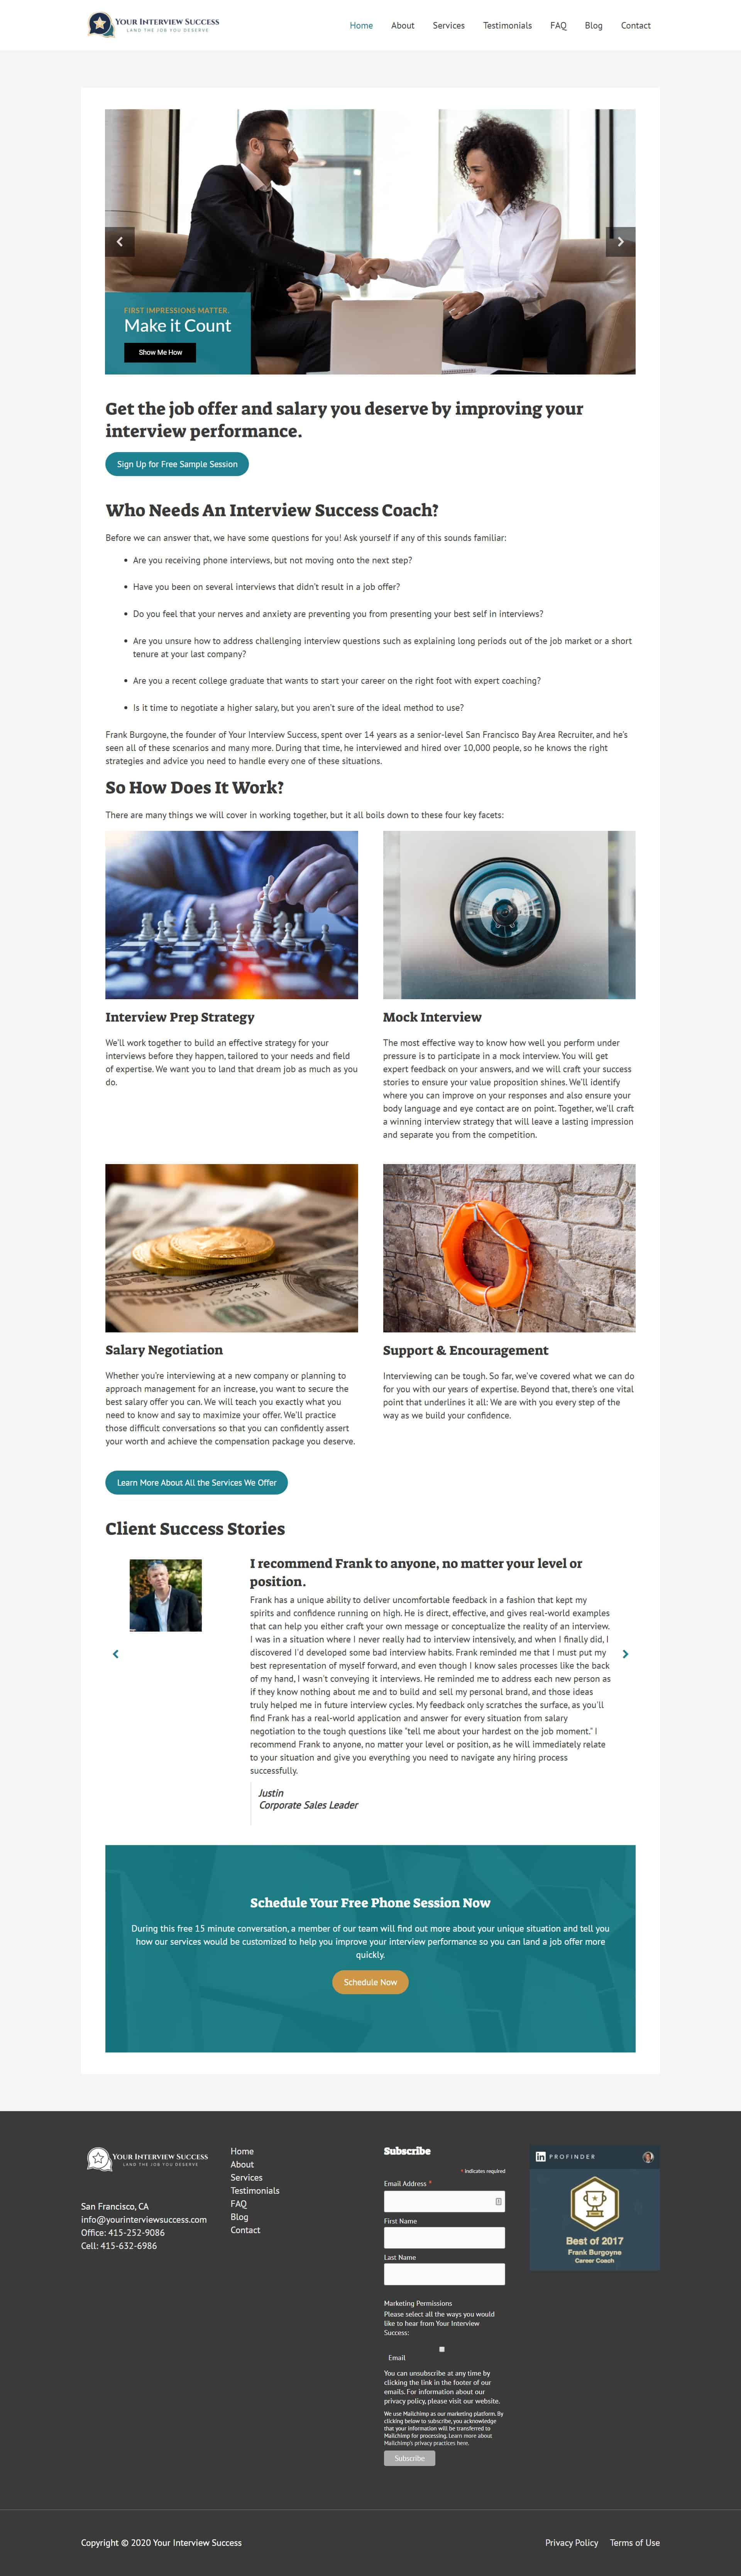 Website Design & Layout Example